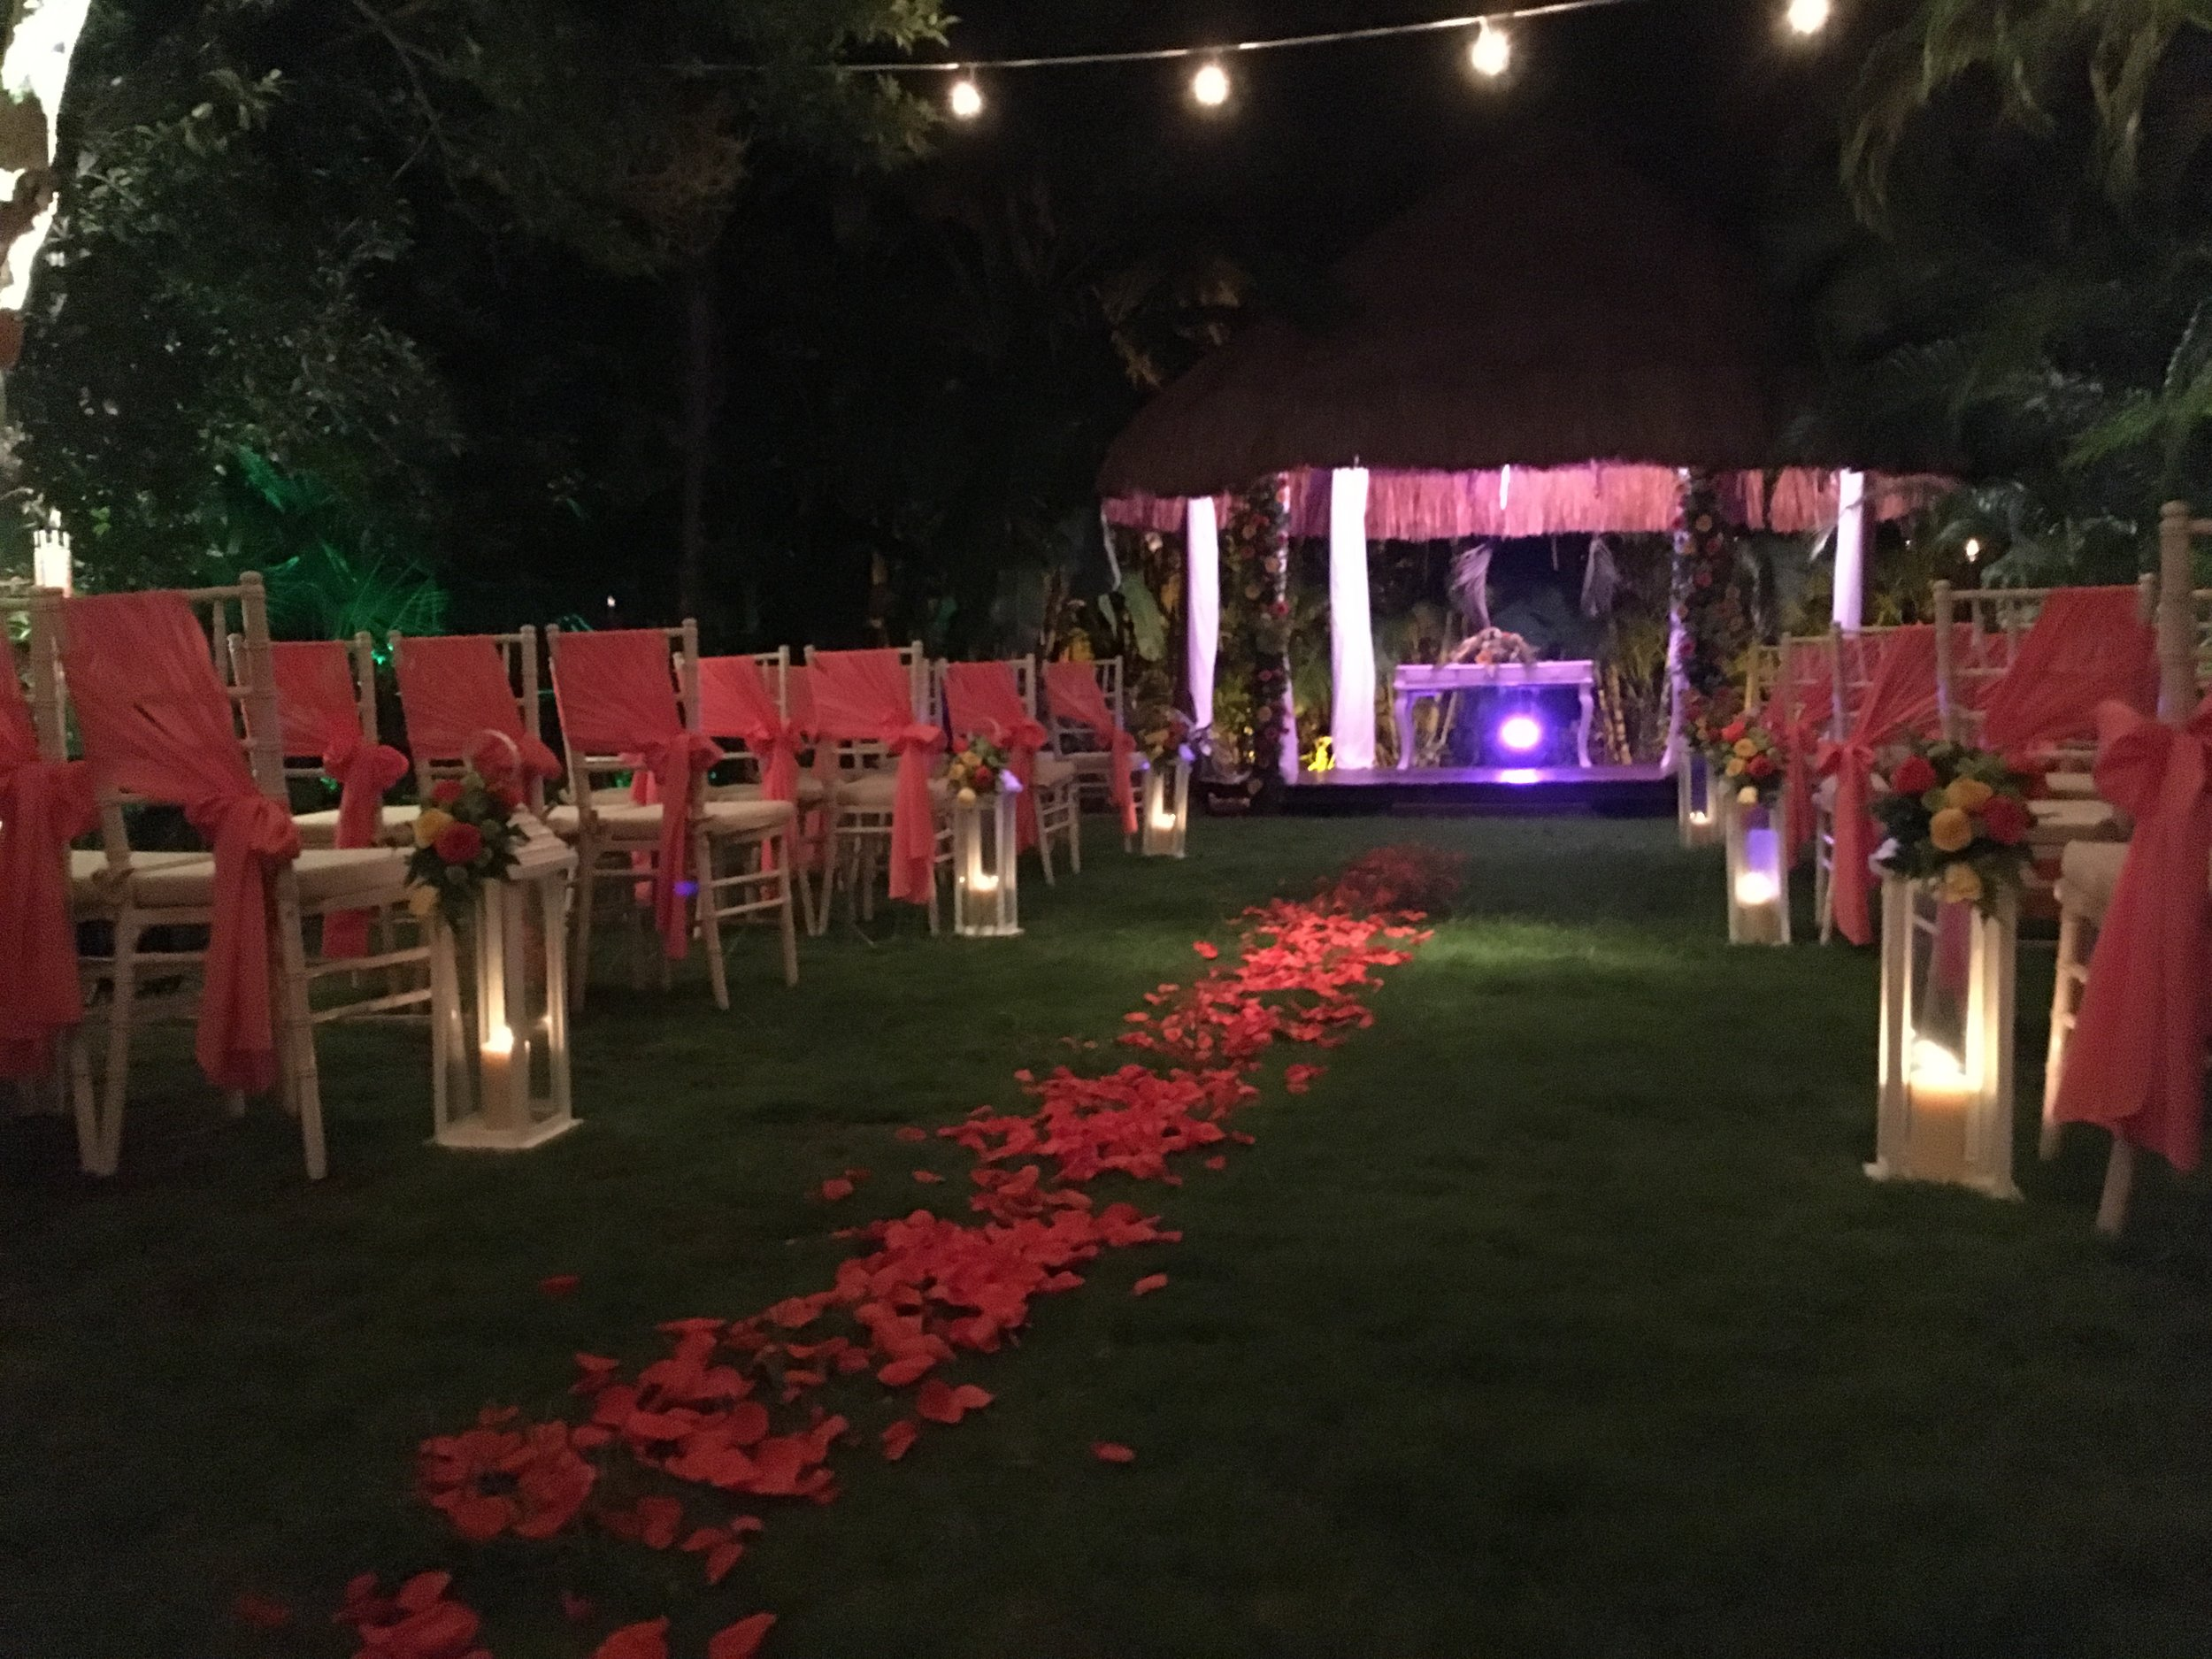 secret garden wedding at night.JPG